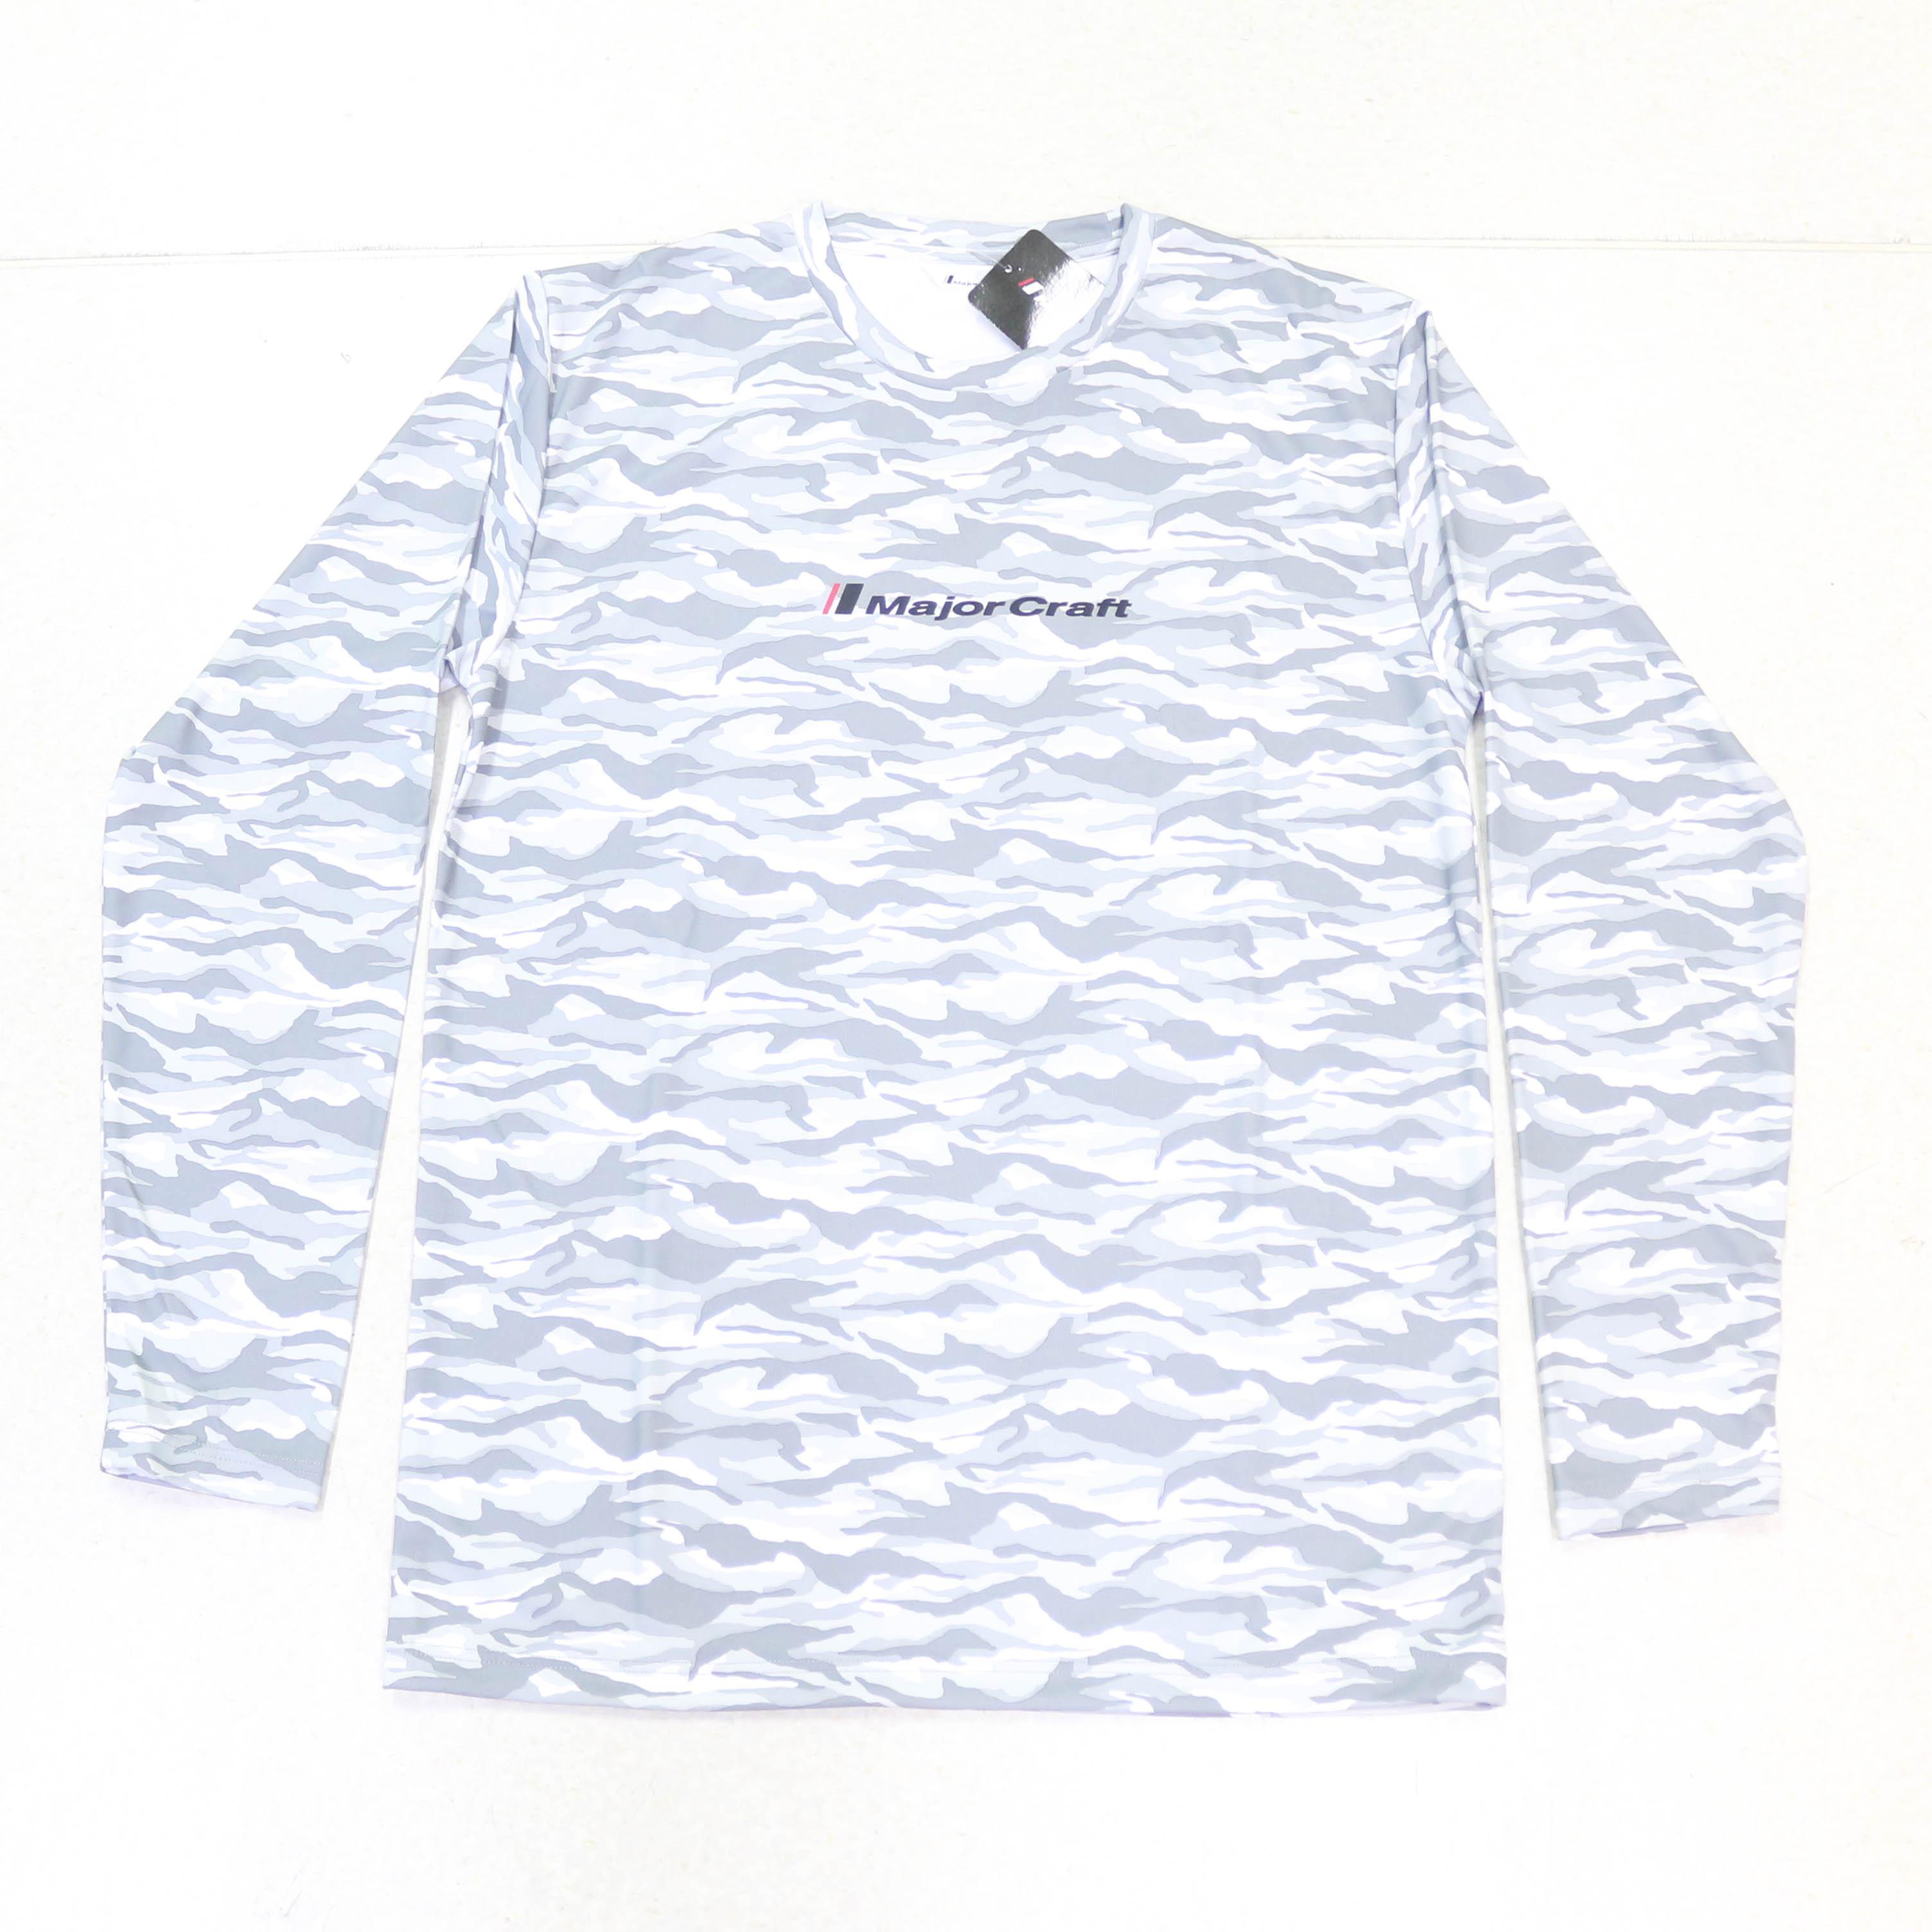 Major Craft T-Shirt Long Sleeve MCW-DLT-L/GCM (3123)